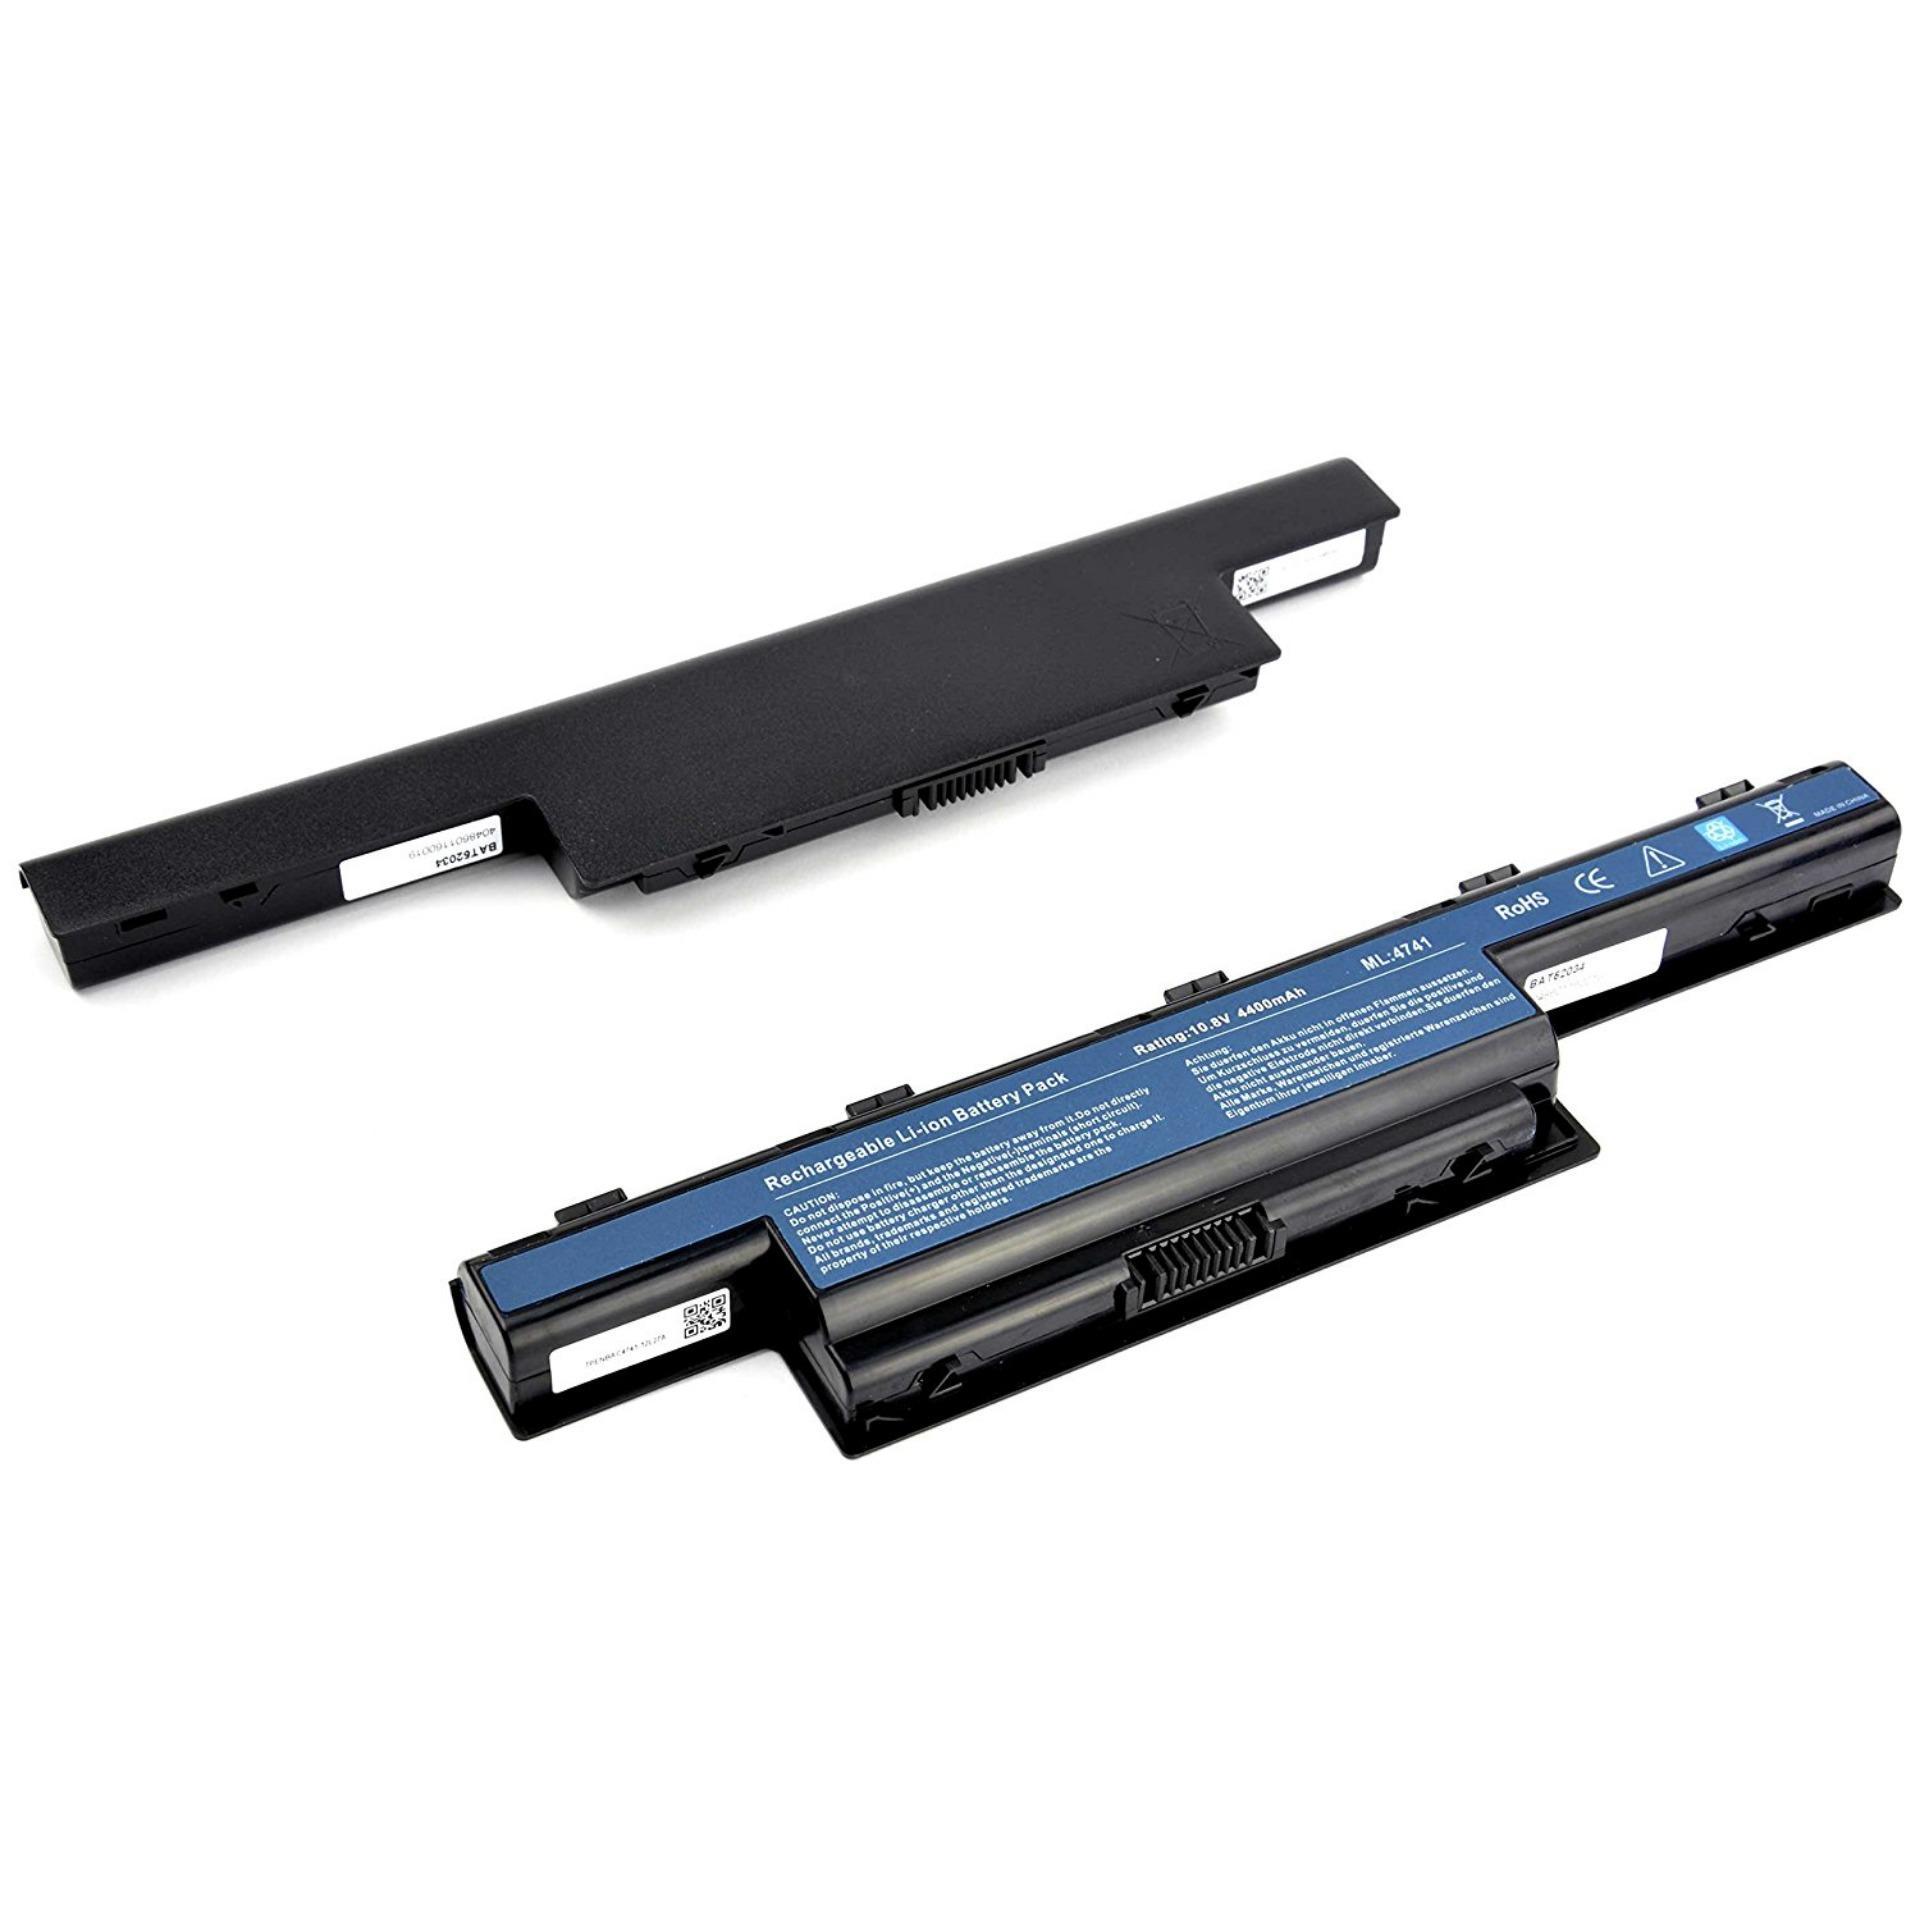 Pin cho Laptop Acer Aspire E1-421 E1-431 E1-471 E1-531 E1-571 Hàng nhập khẩu bảo hành 12 tháng lỗi 1 đổi 1